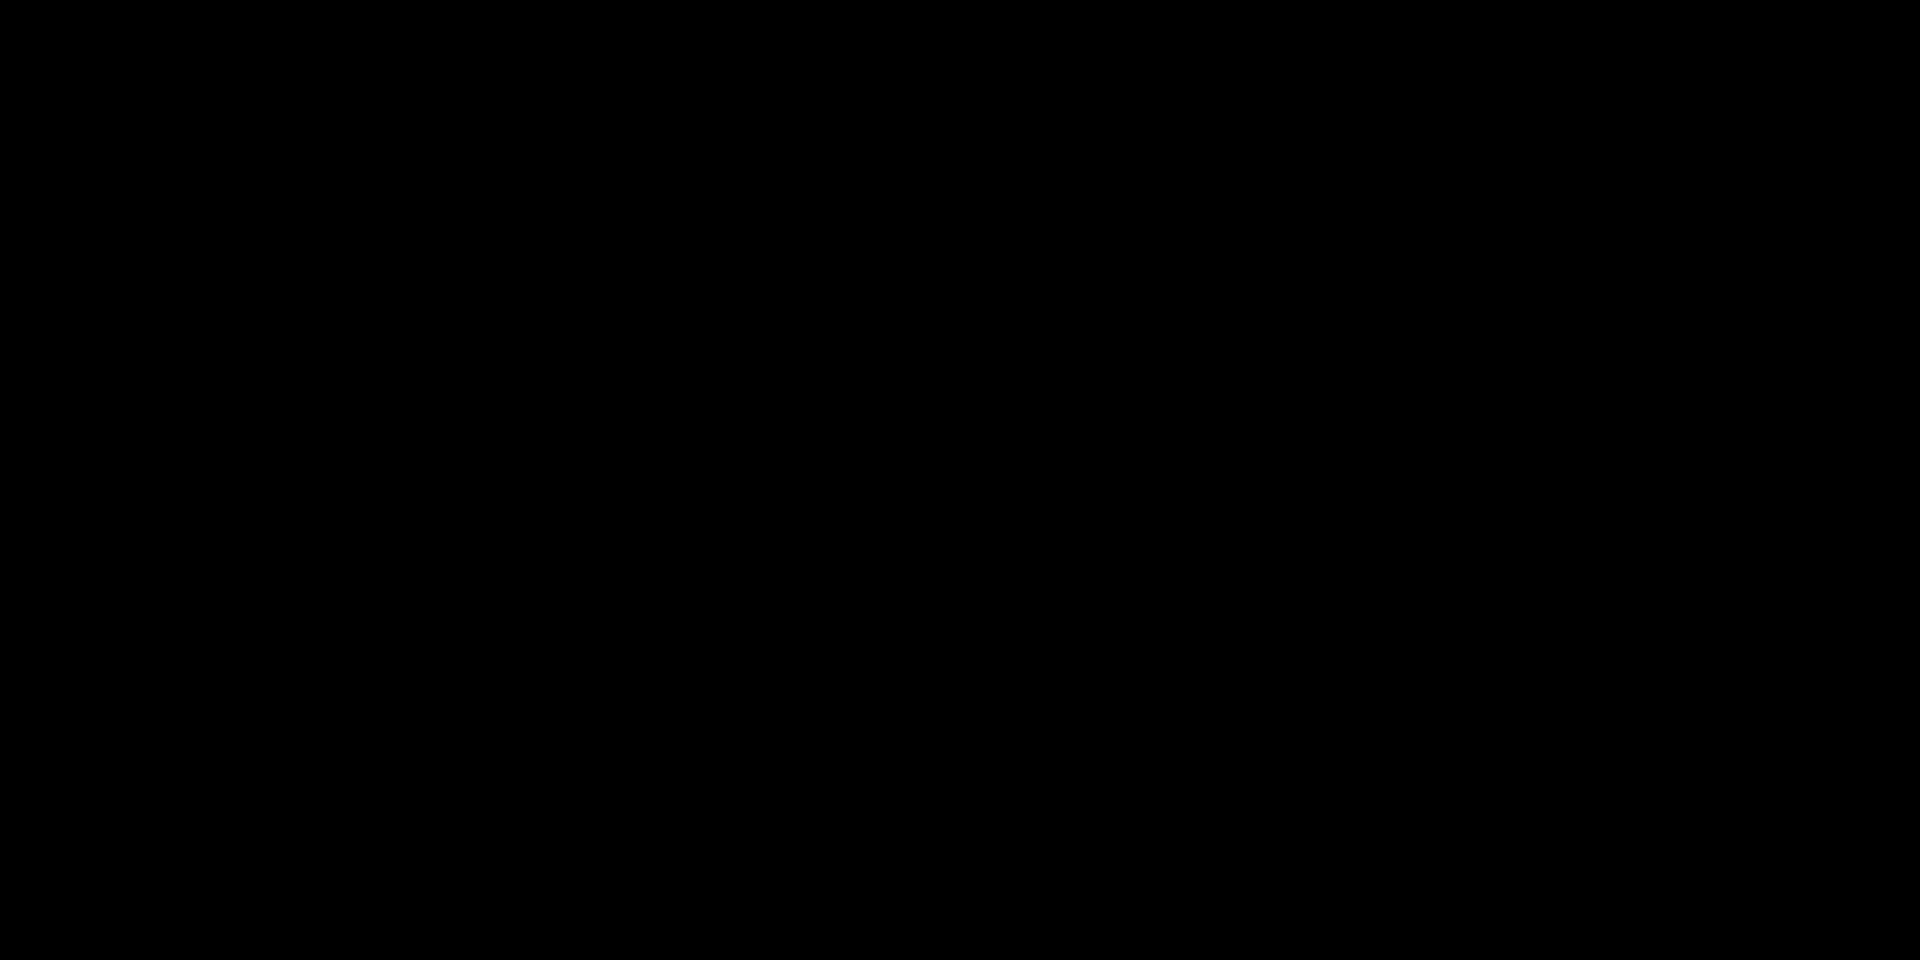 cyber-3400789_1920